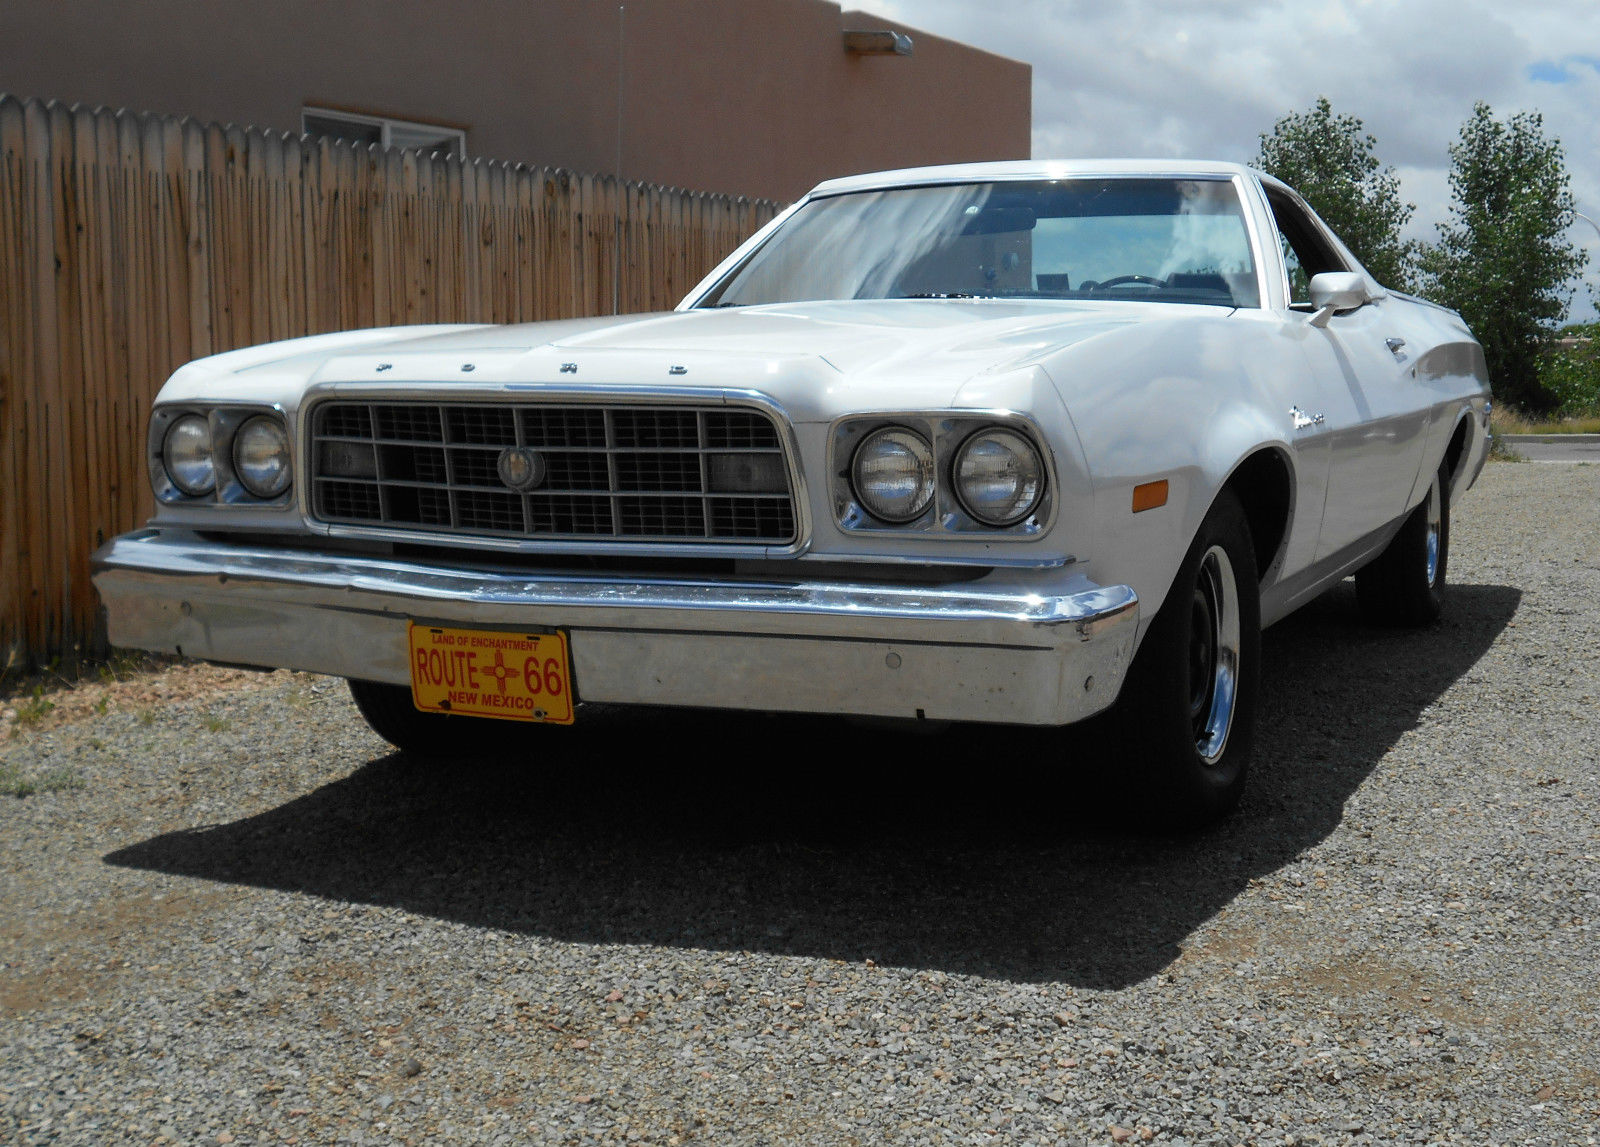 All American Classic Cars: 1973 Ford Ranchero